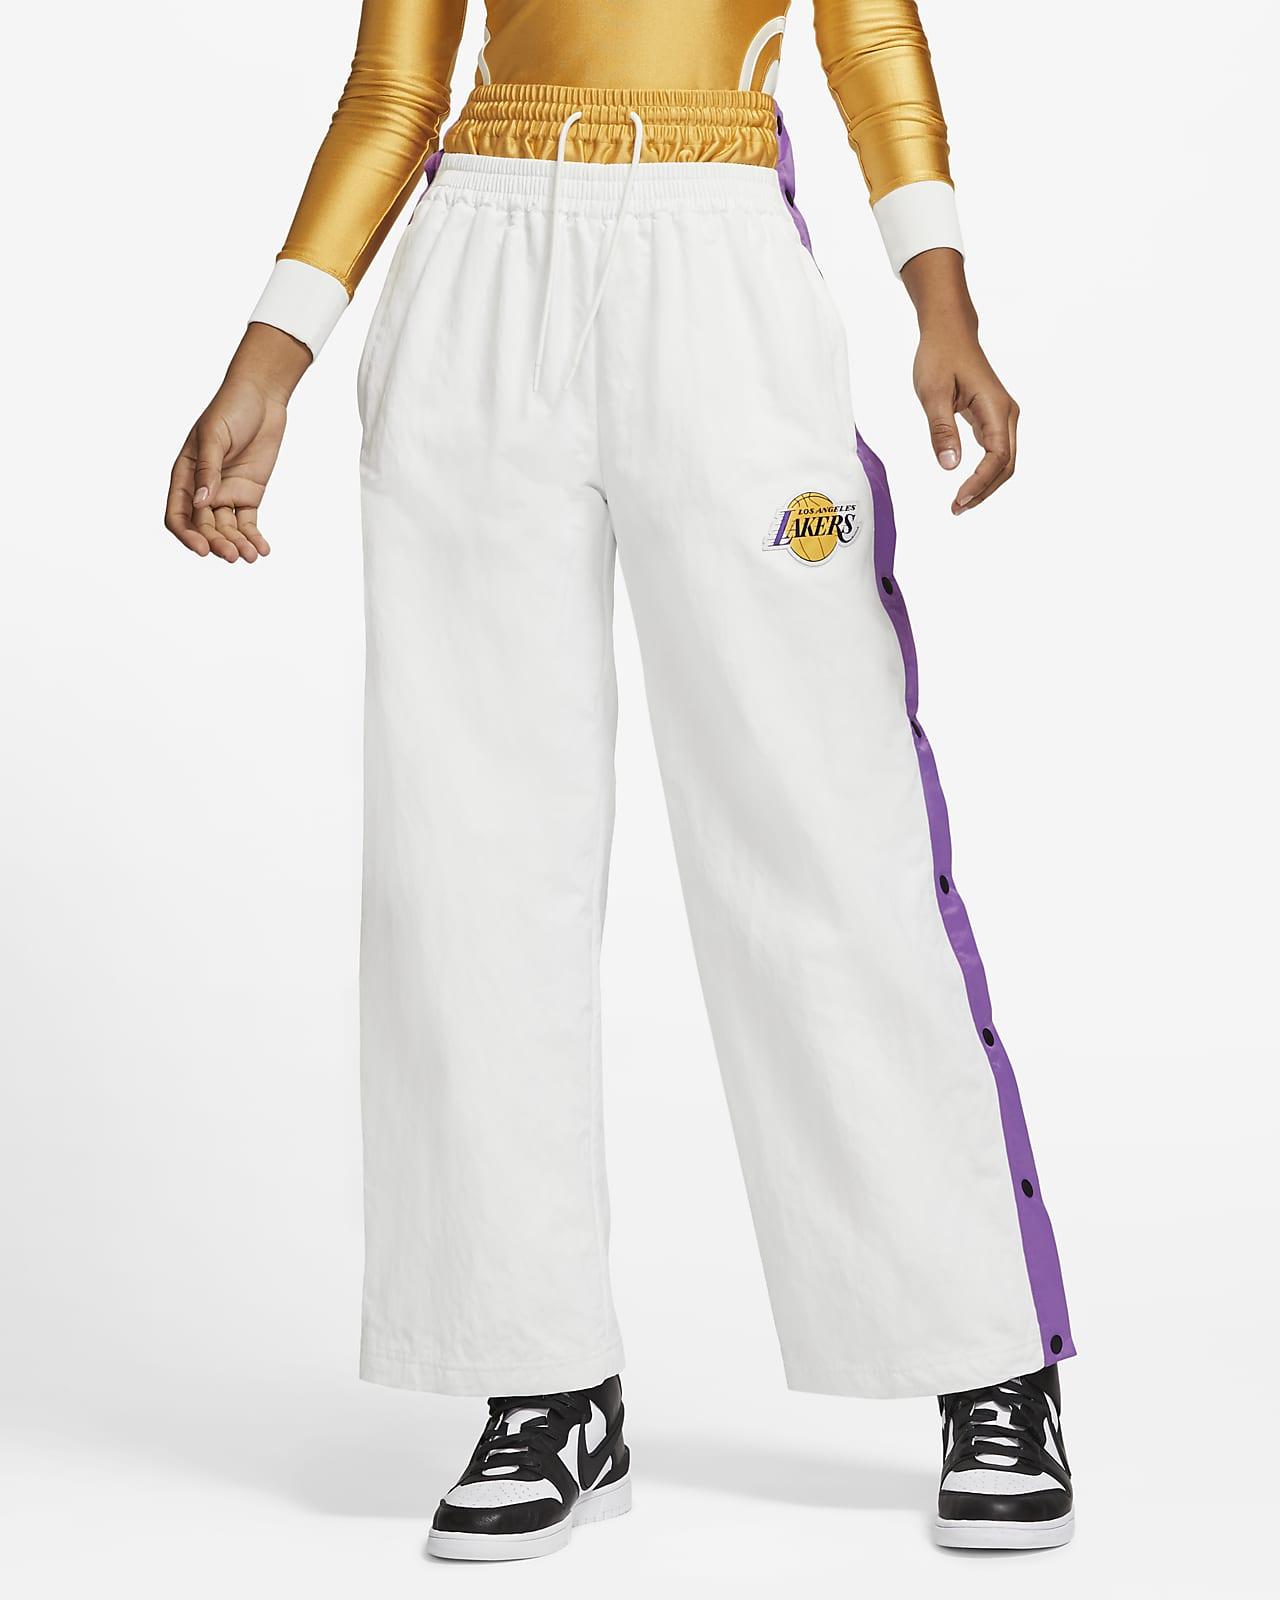 Nike x AMBUSH® Women's Tearaway Trousers